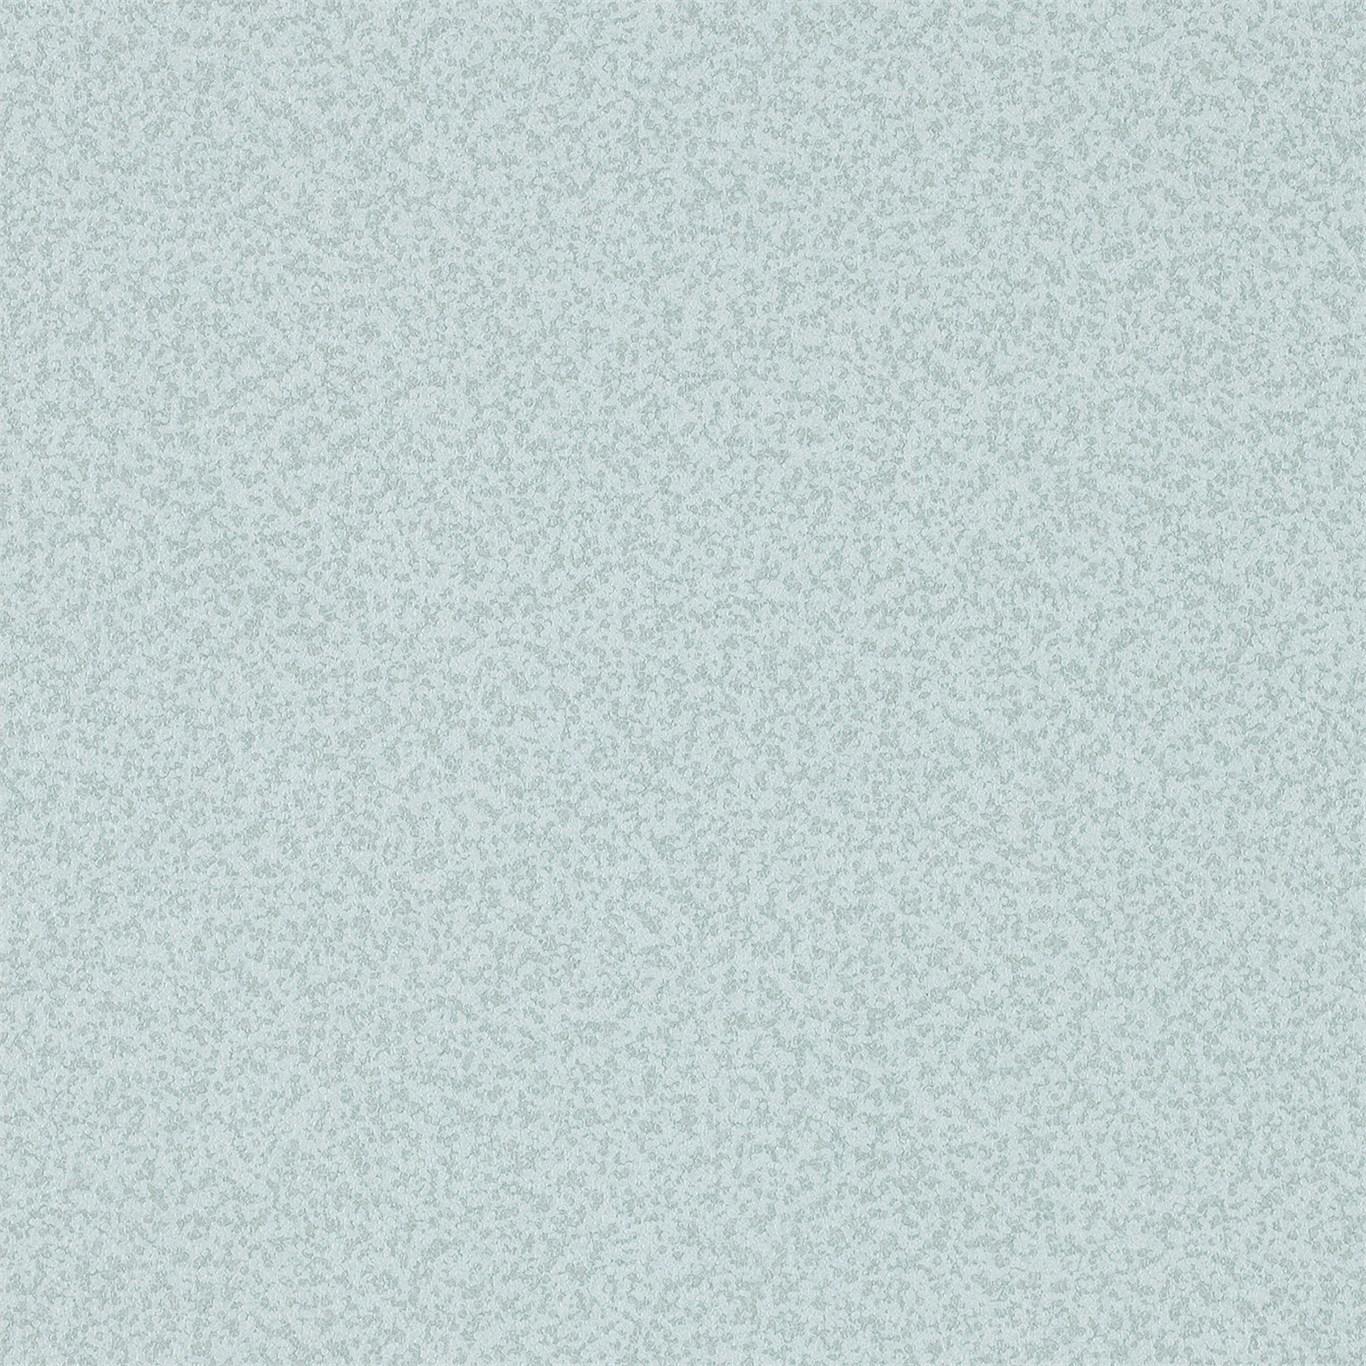 Английские обои Zoffany,  коллекция Prism Vinyls, артикул311766